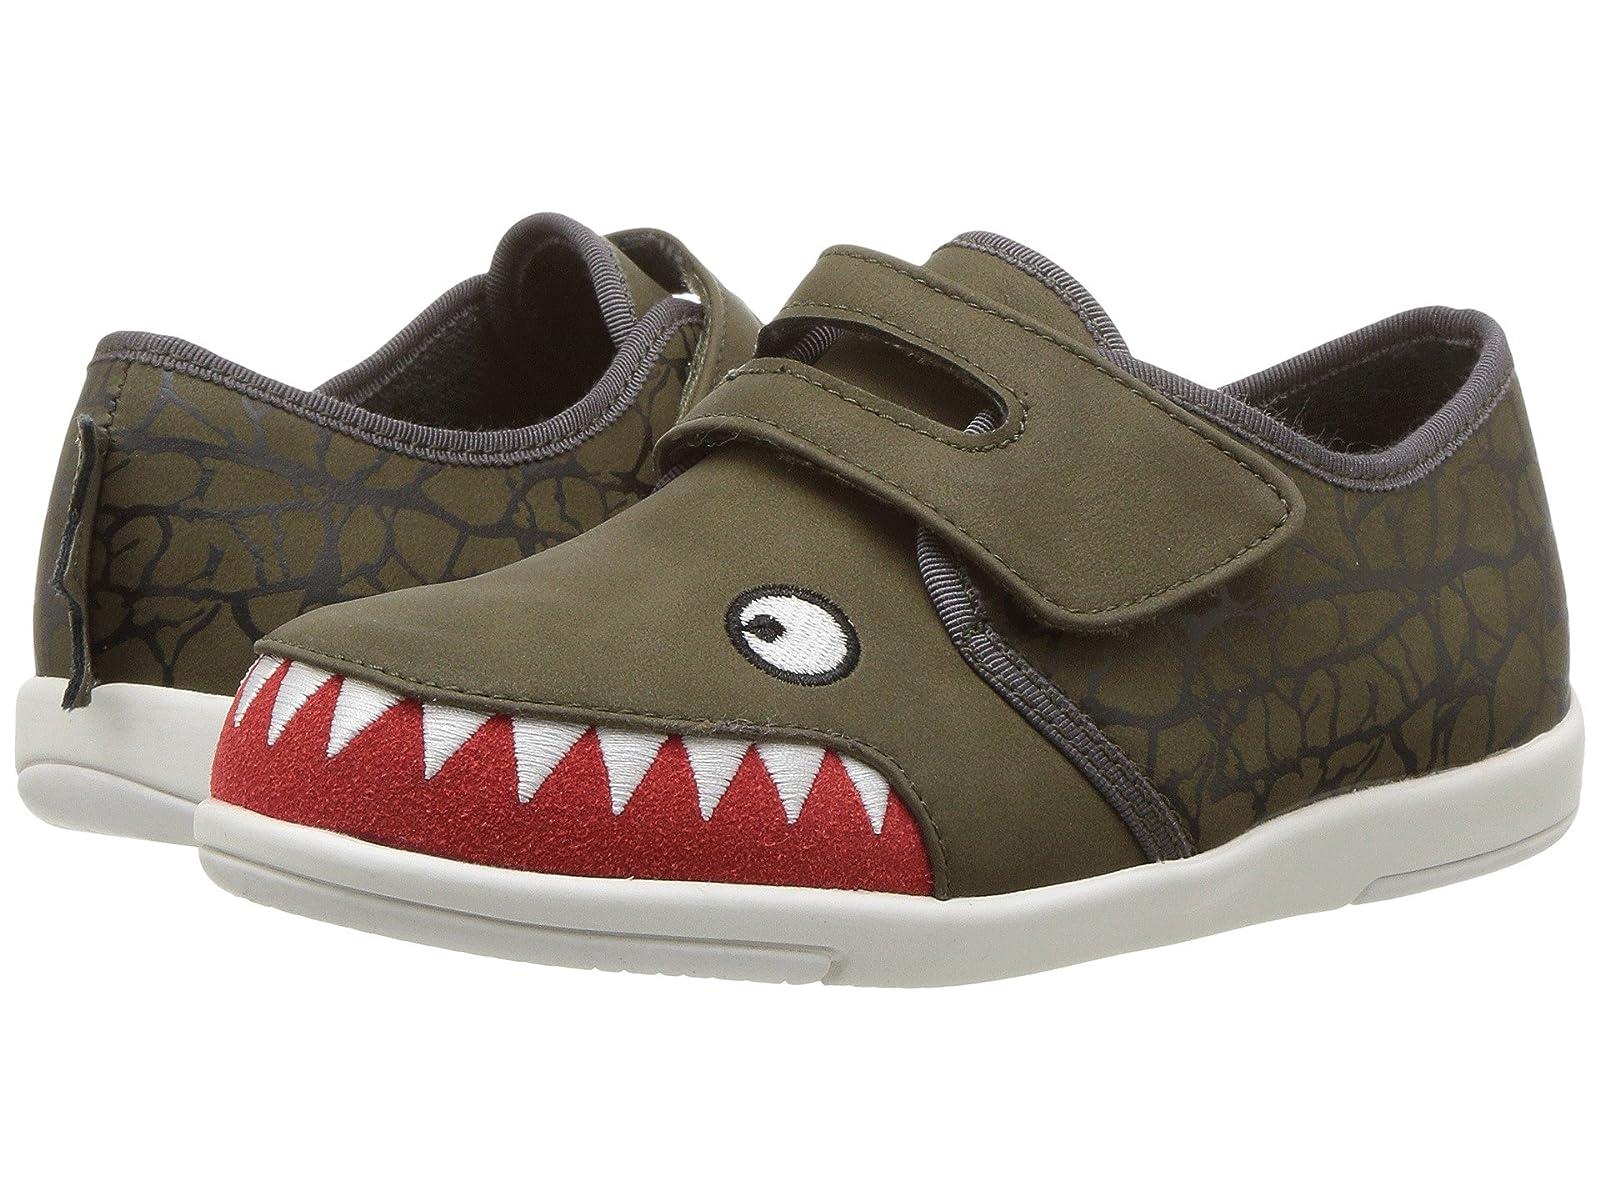 EMU Australia Kid/Big Kids Croc Sneaker (Toddler/Little Kid/Big Australia Kid) df59e2